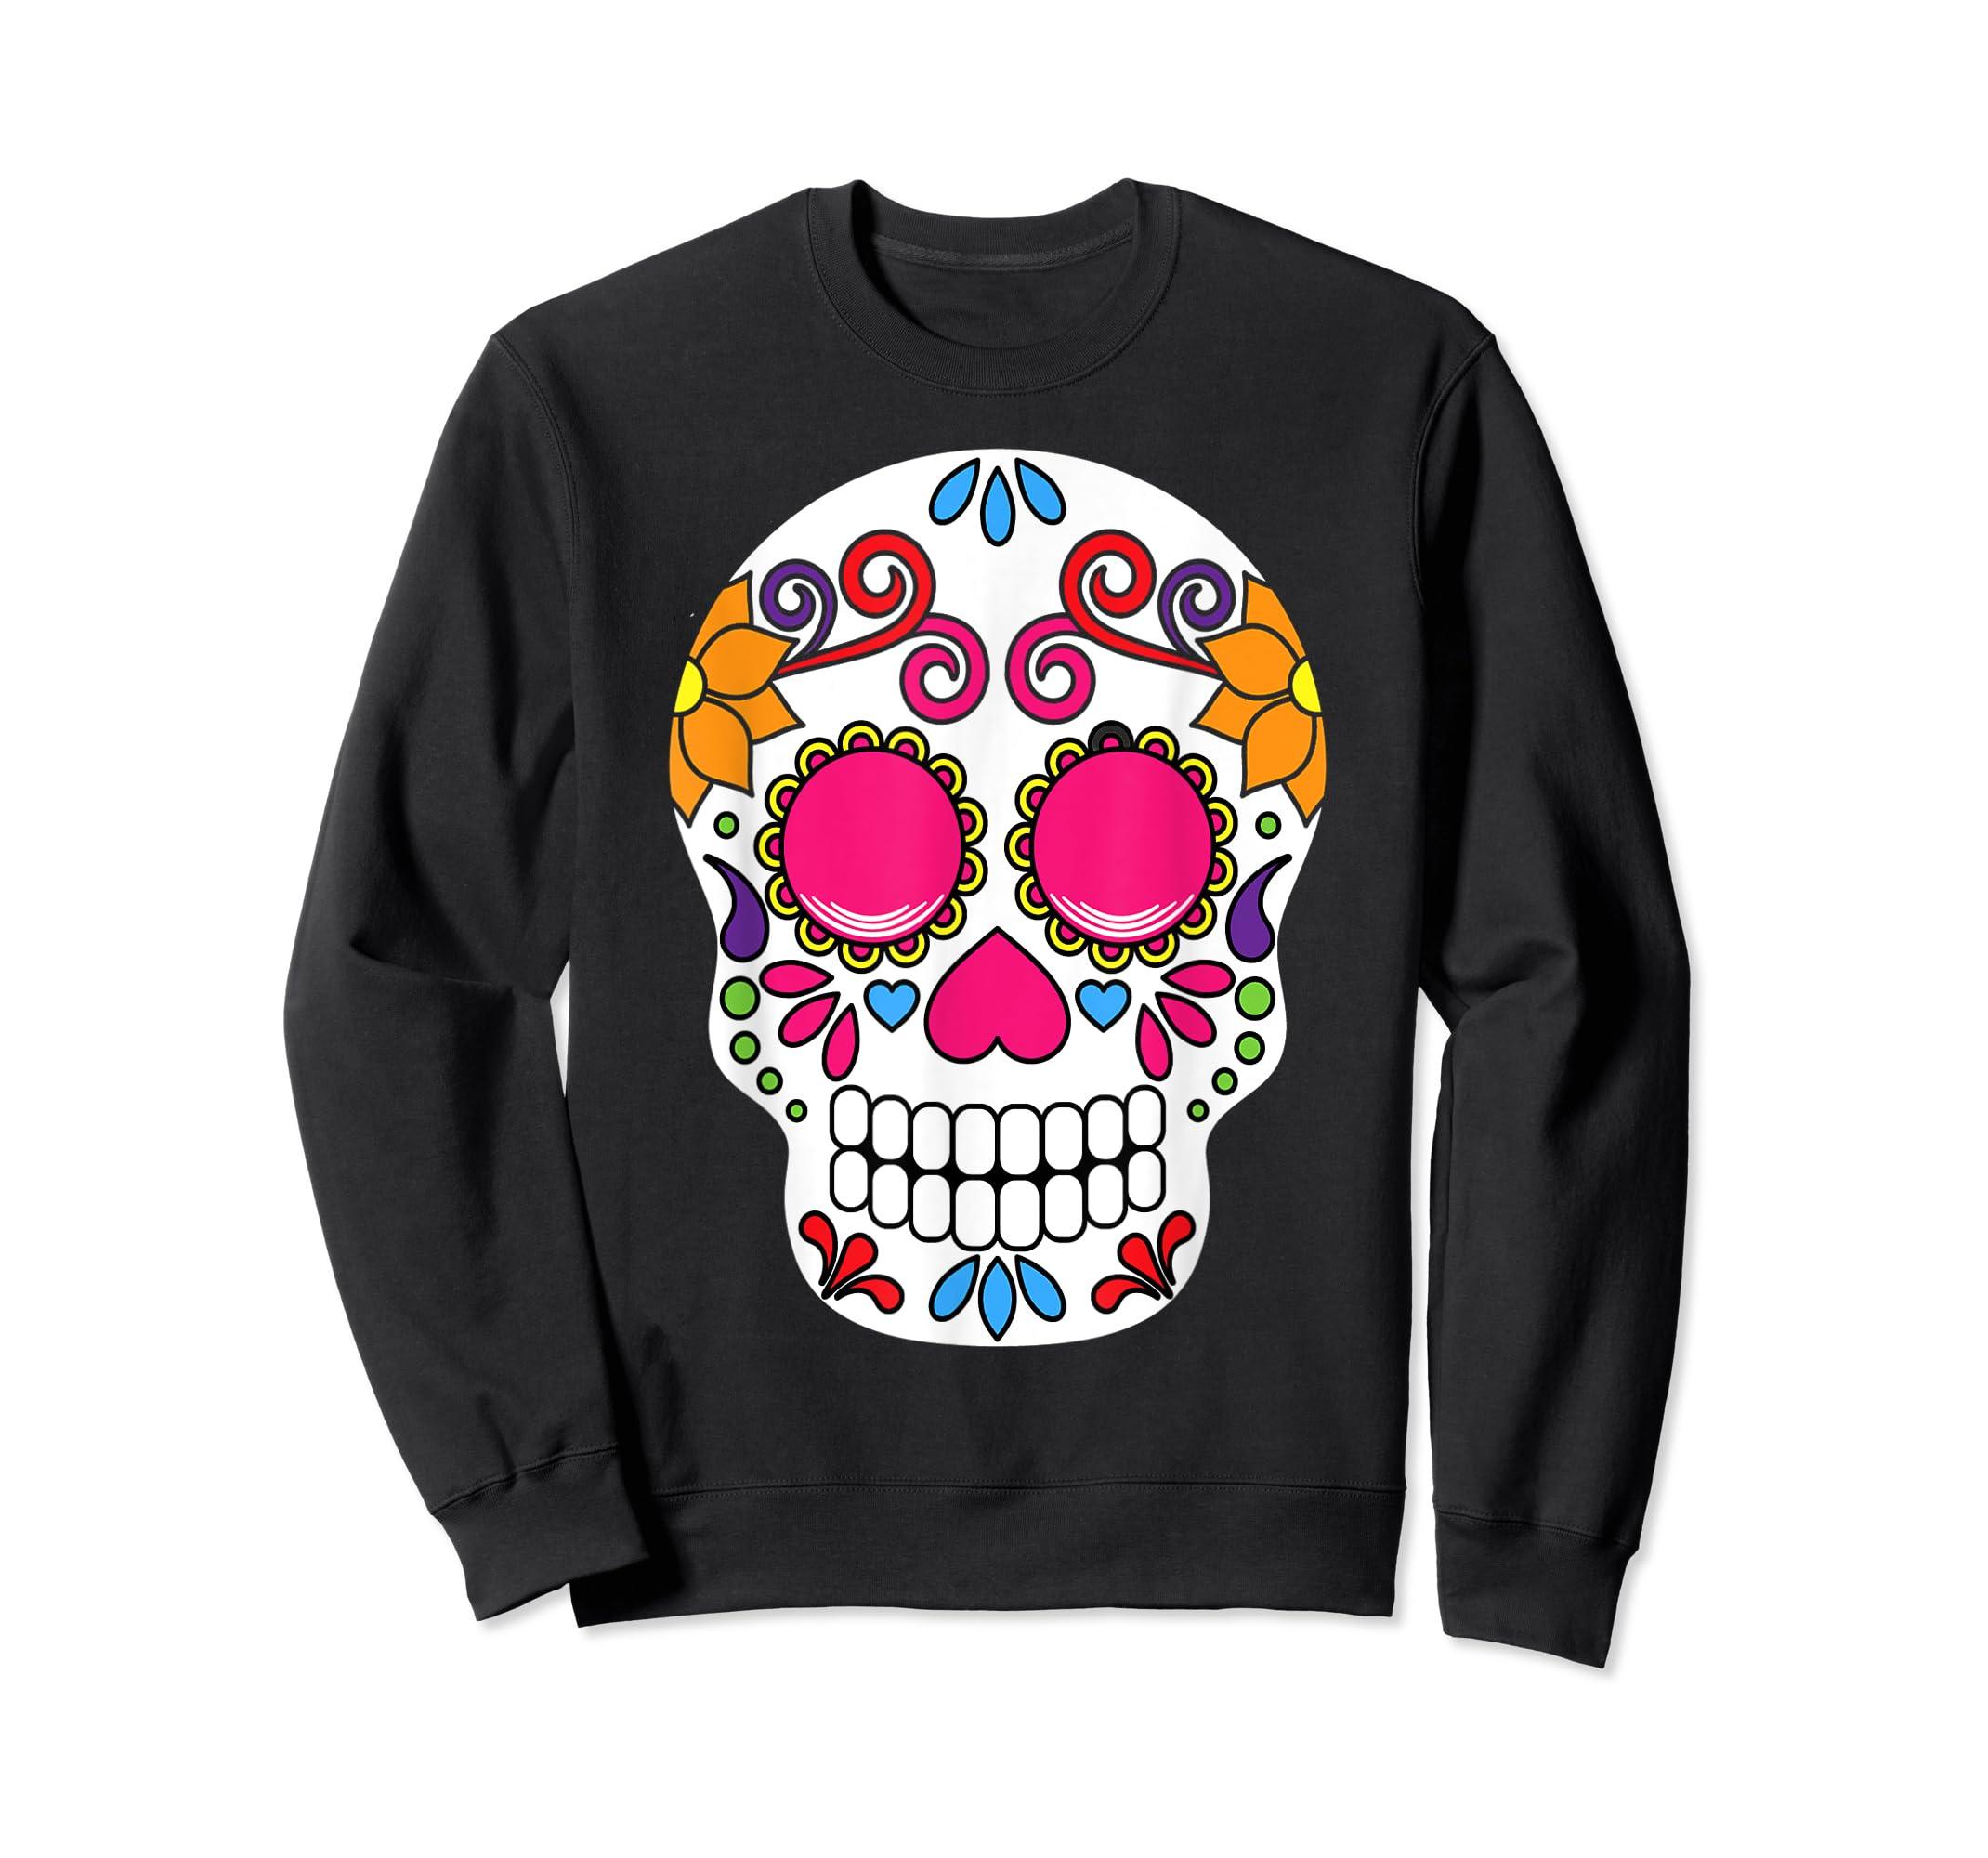 Colorful Day Of The Dead Sugar Skull Halloween T-shirt-Sweatshirt-Black